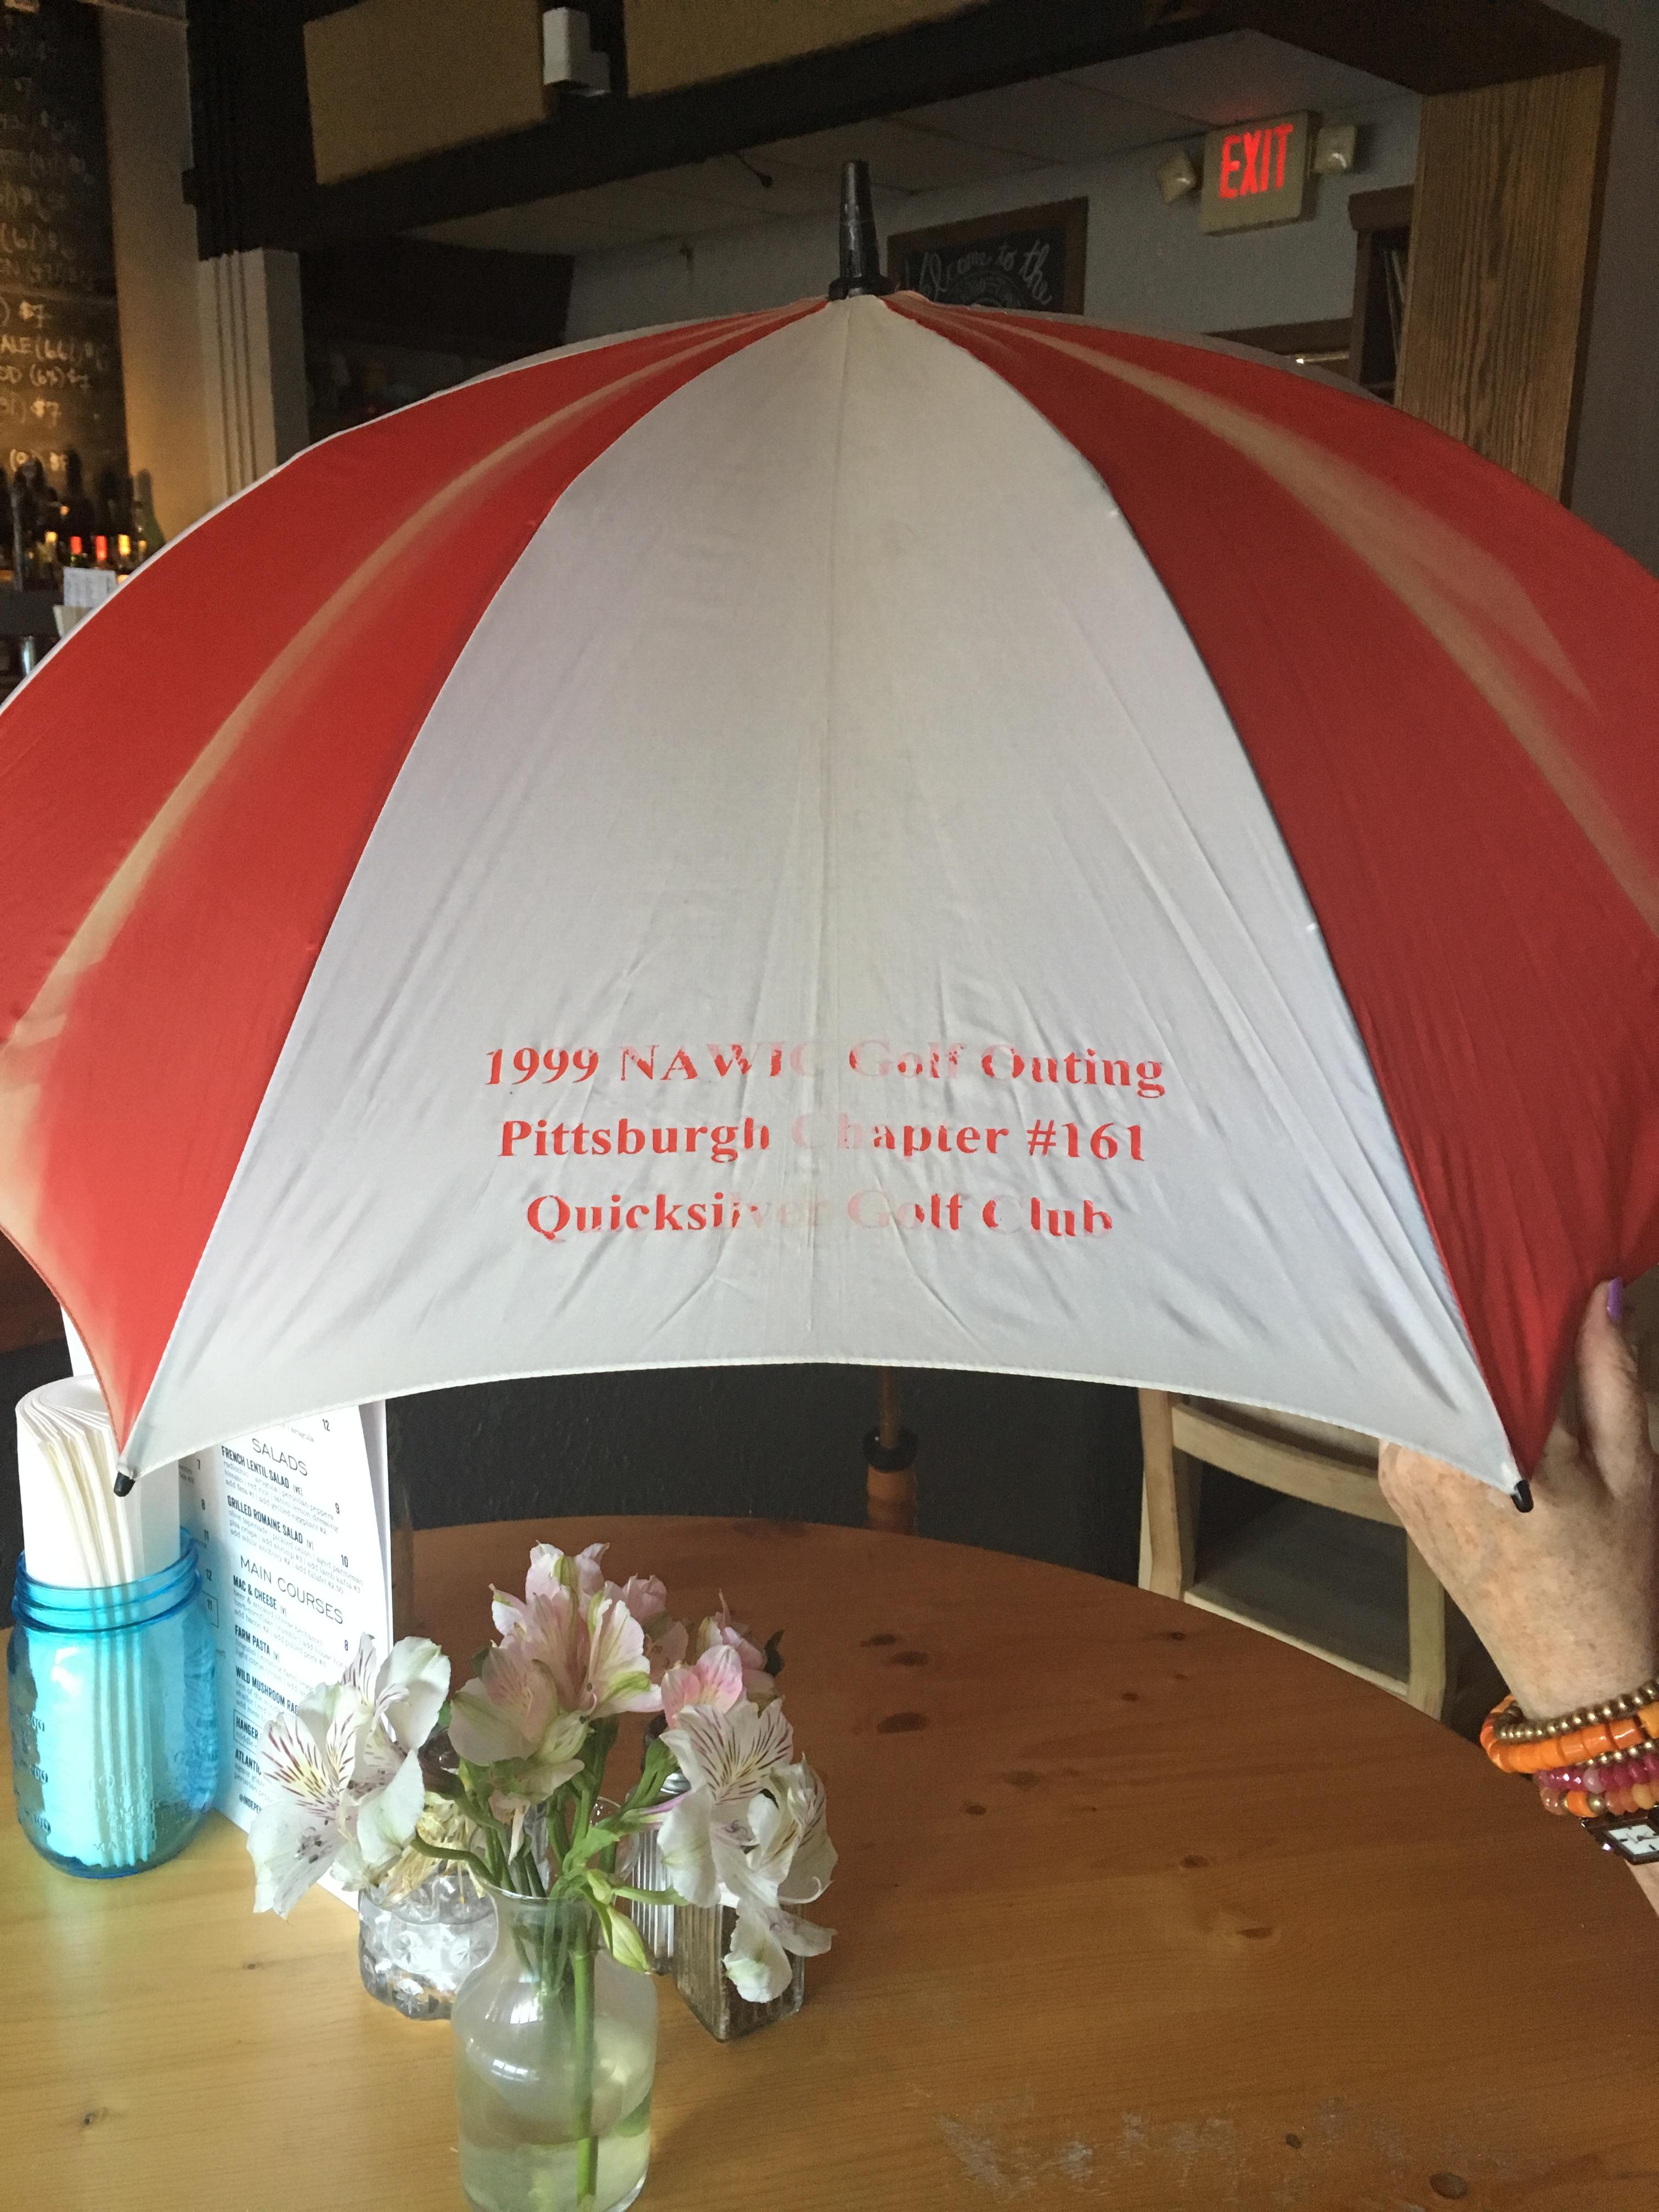 1999 NAWIC umbrella